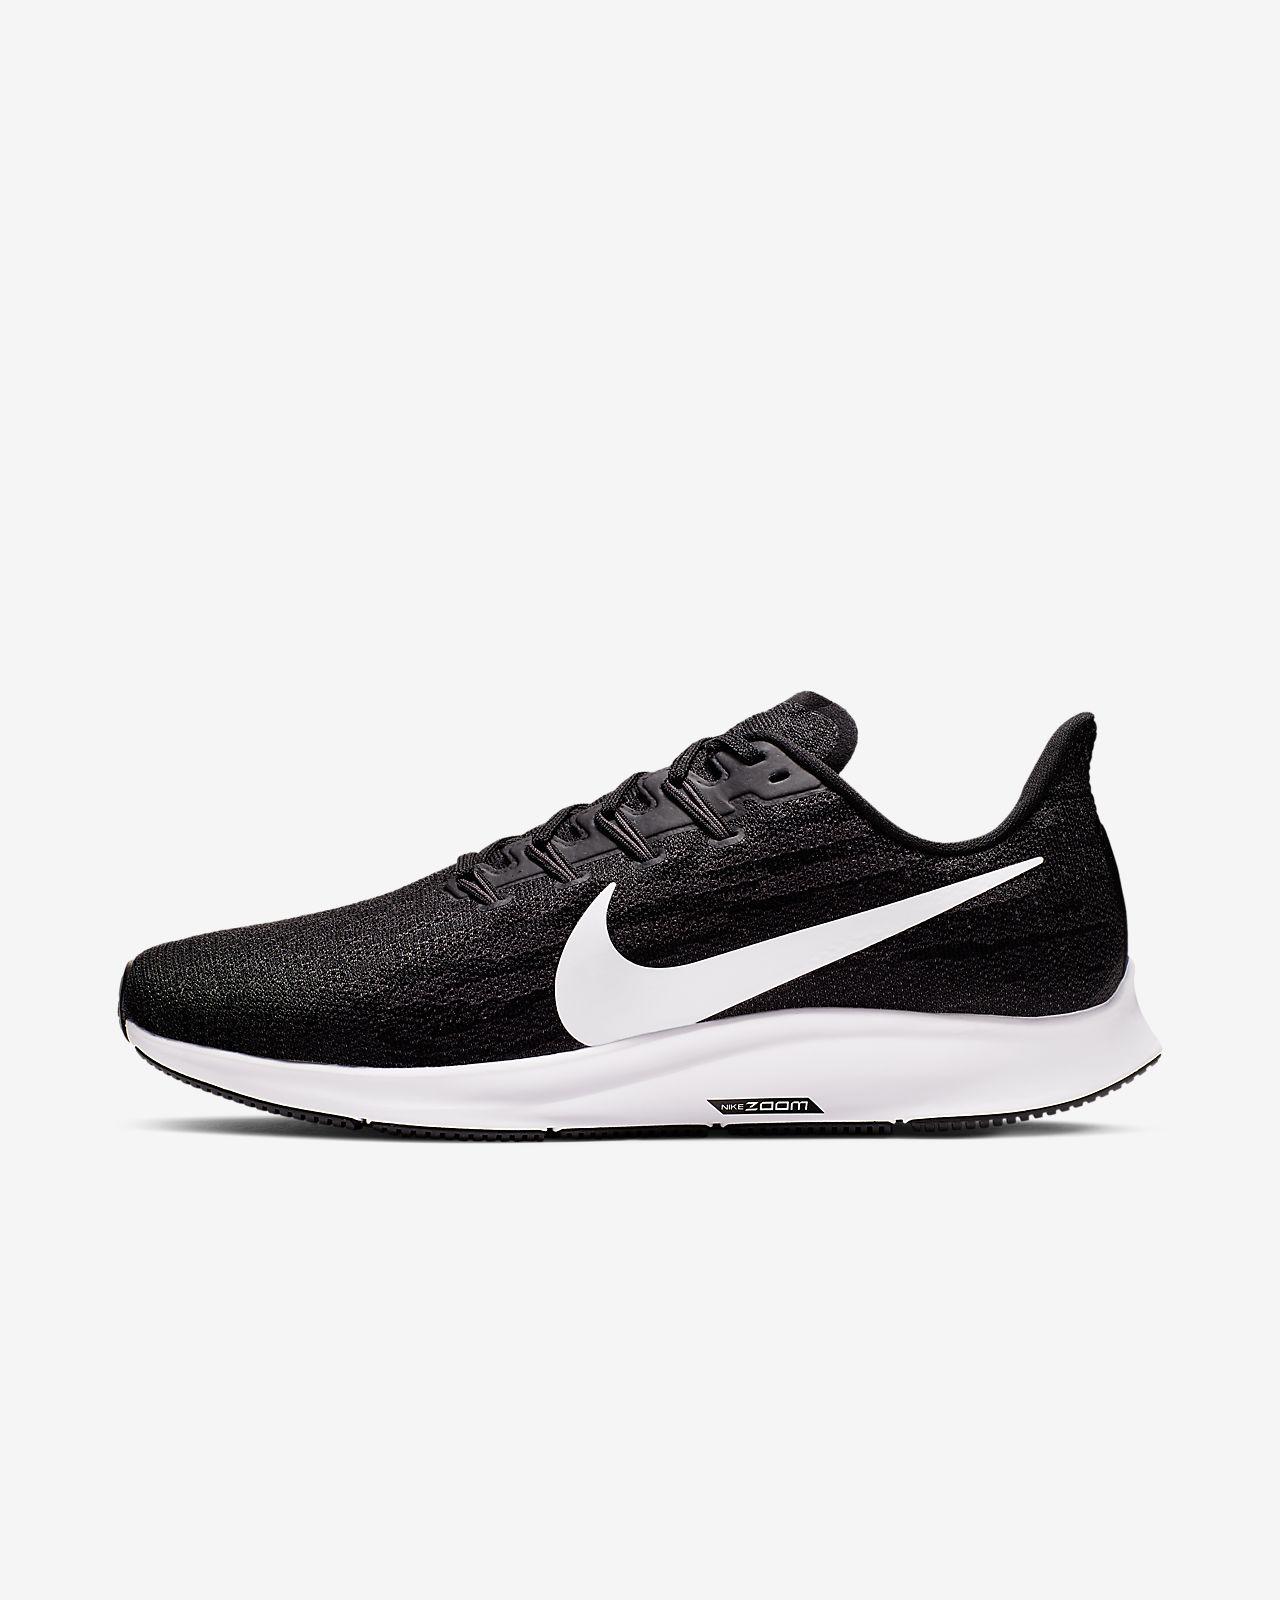 Chaussure de running Nike Air Zoom Pegasus 36 pour Homme (large)